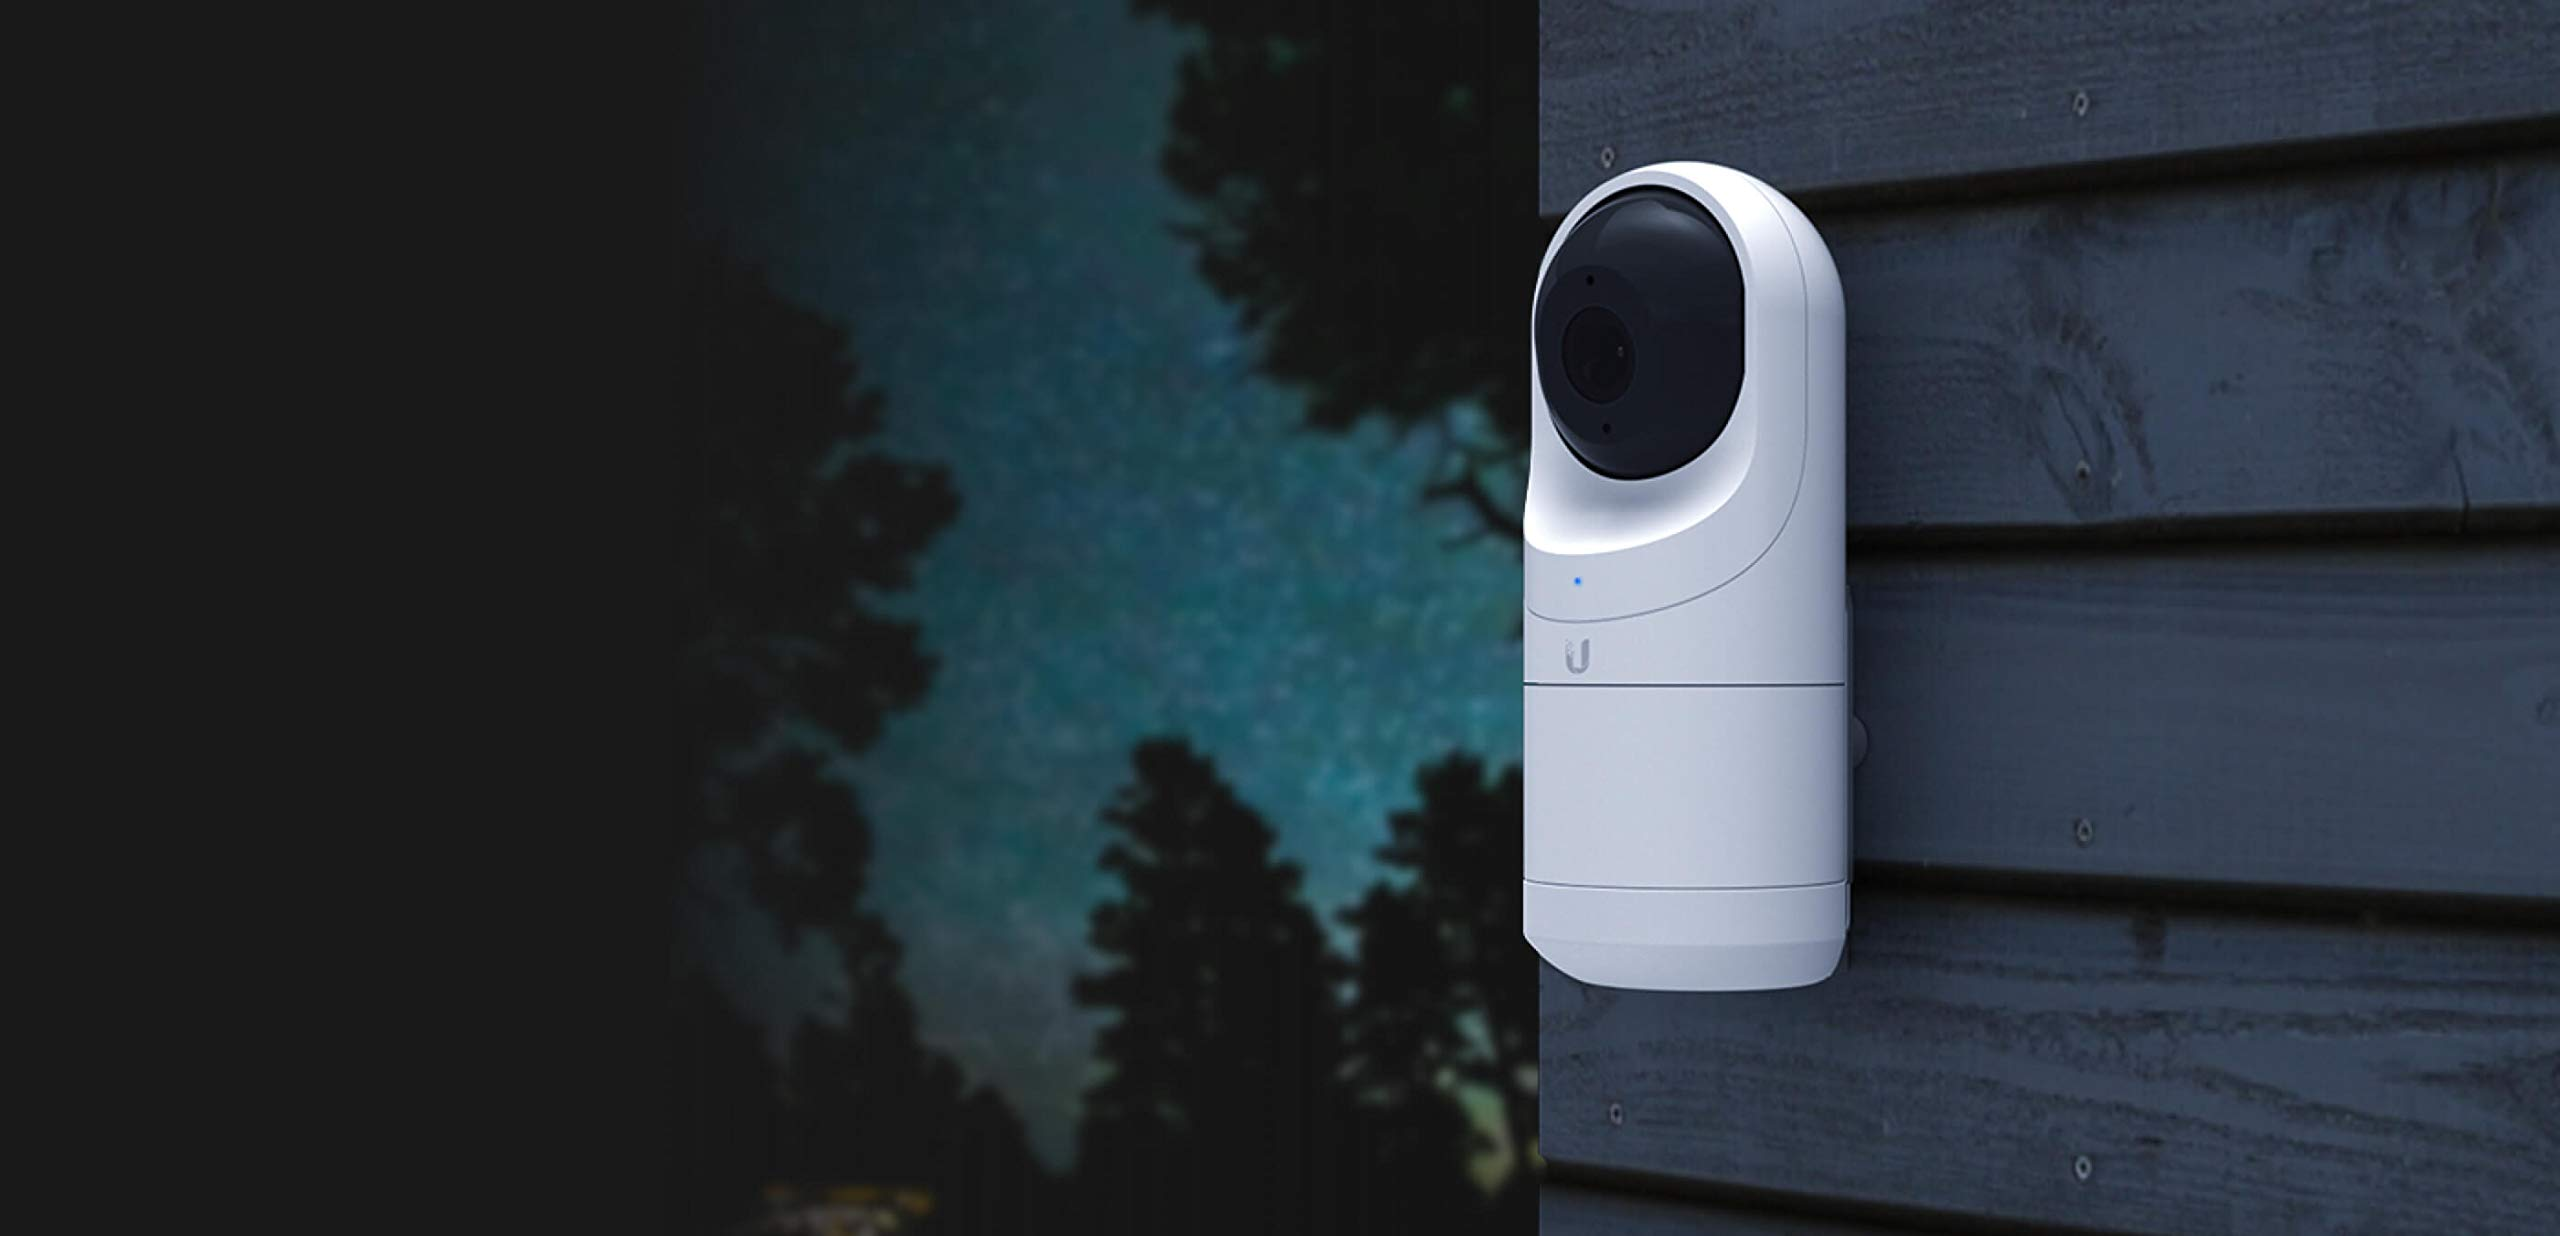 Ubiquiti UniFi Video G3 Flex Indoor/Outdoor PoE Camera (UVC-G3-FLEX) by UBIQUITI NETWORKS COMMERCIAL